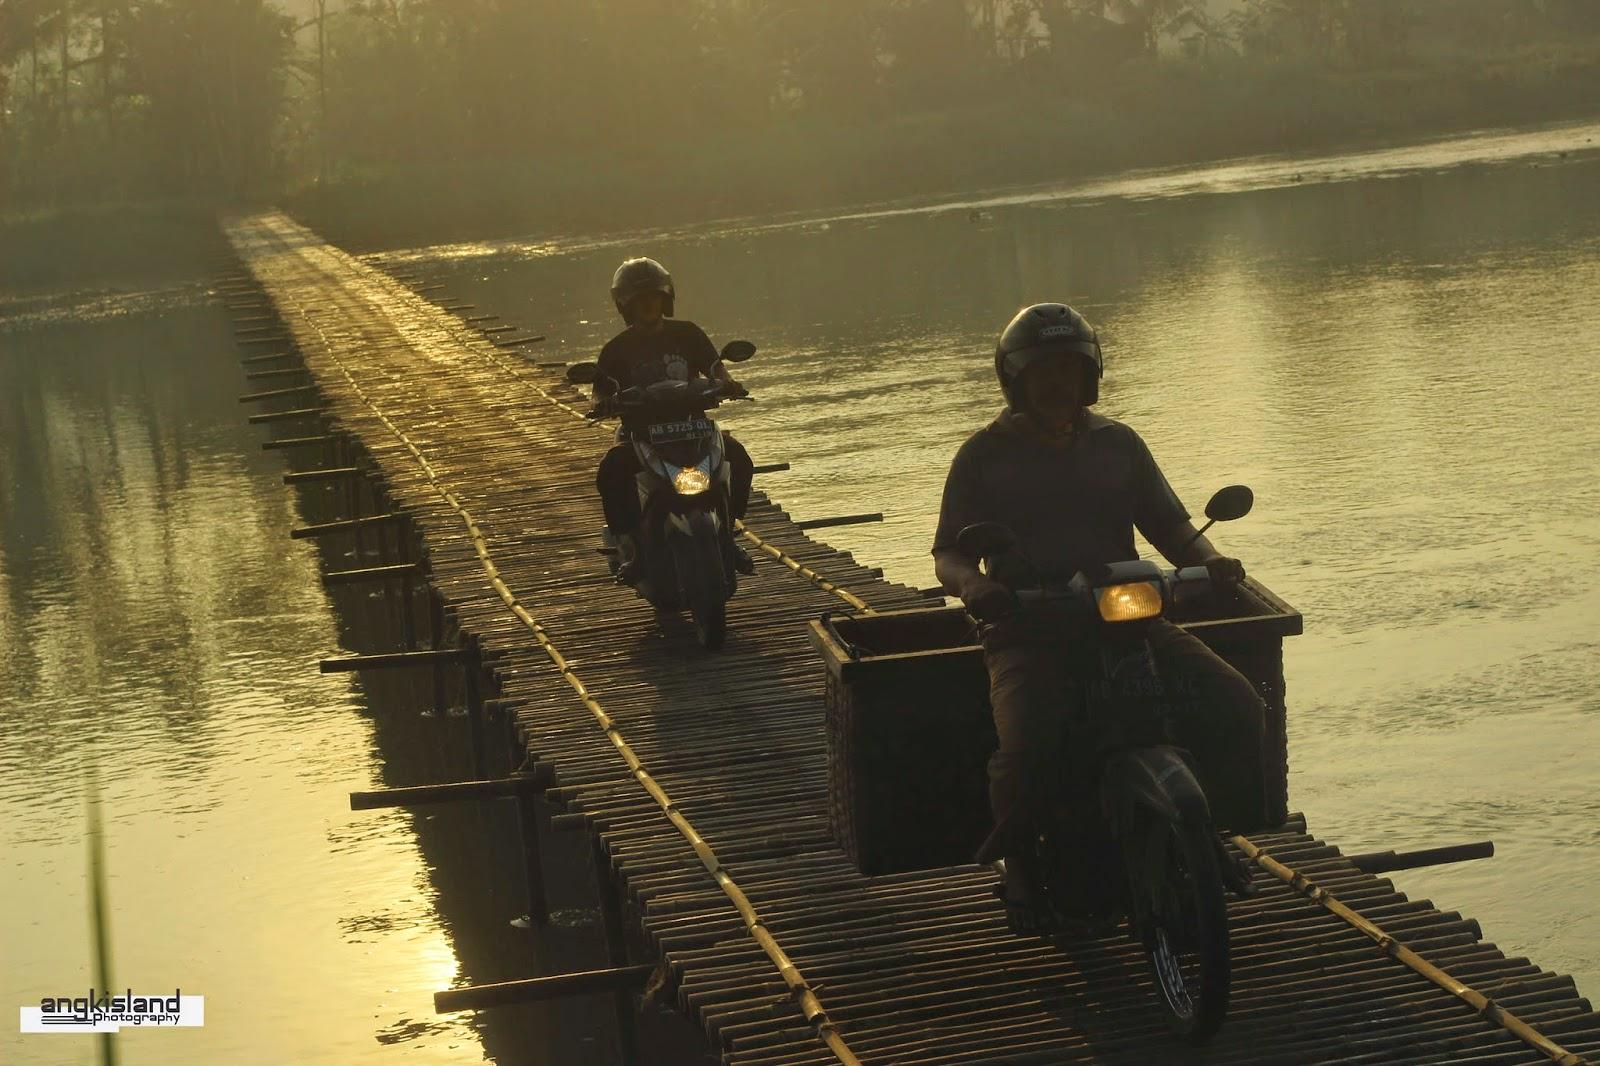 naik motor diatas jembatan